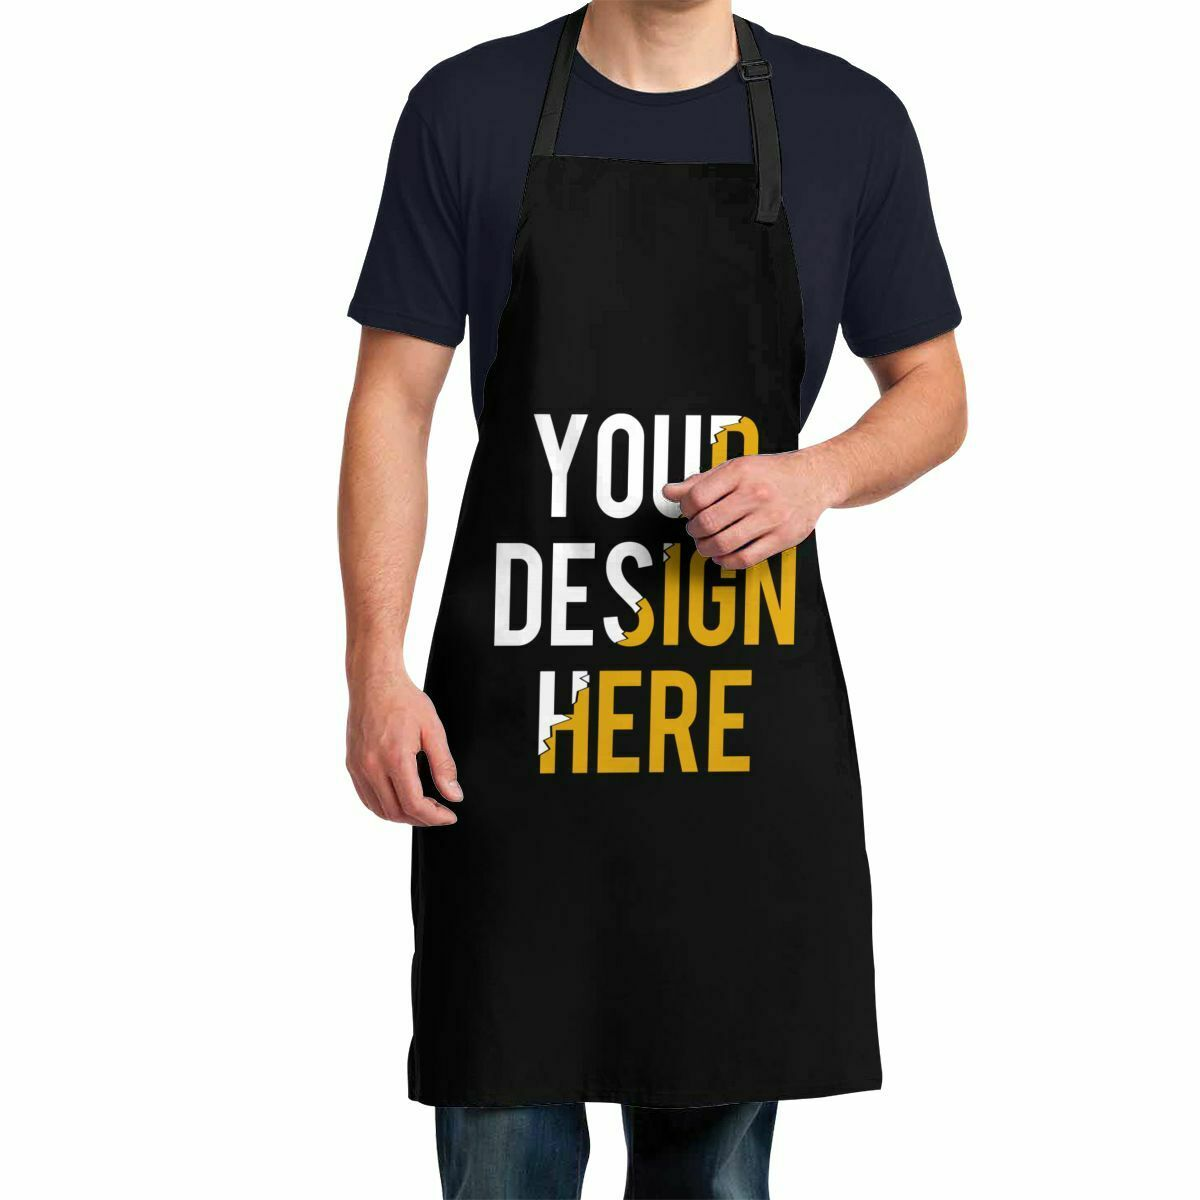 Cooking Aprons Cartoon Forest Monkey Chef Kitchen Plus Size Apron Baking Grilling Waterproof Customized Lab Bib Apron Large for Men Women Adults Man Teen Girls